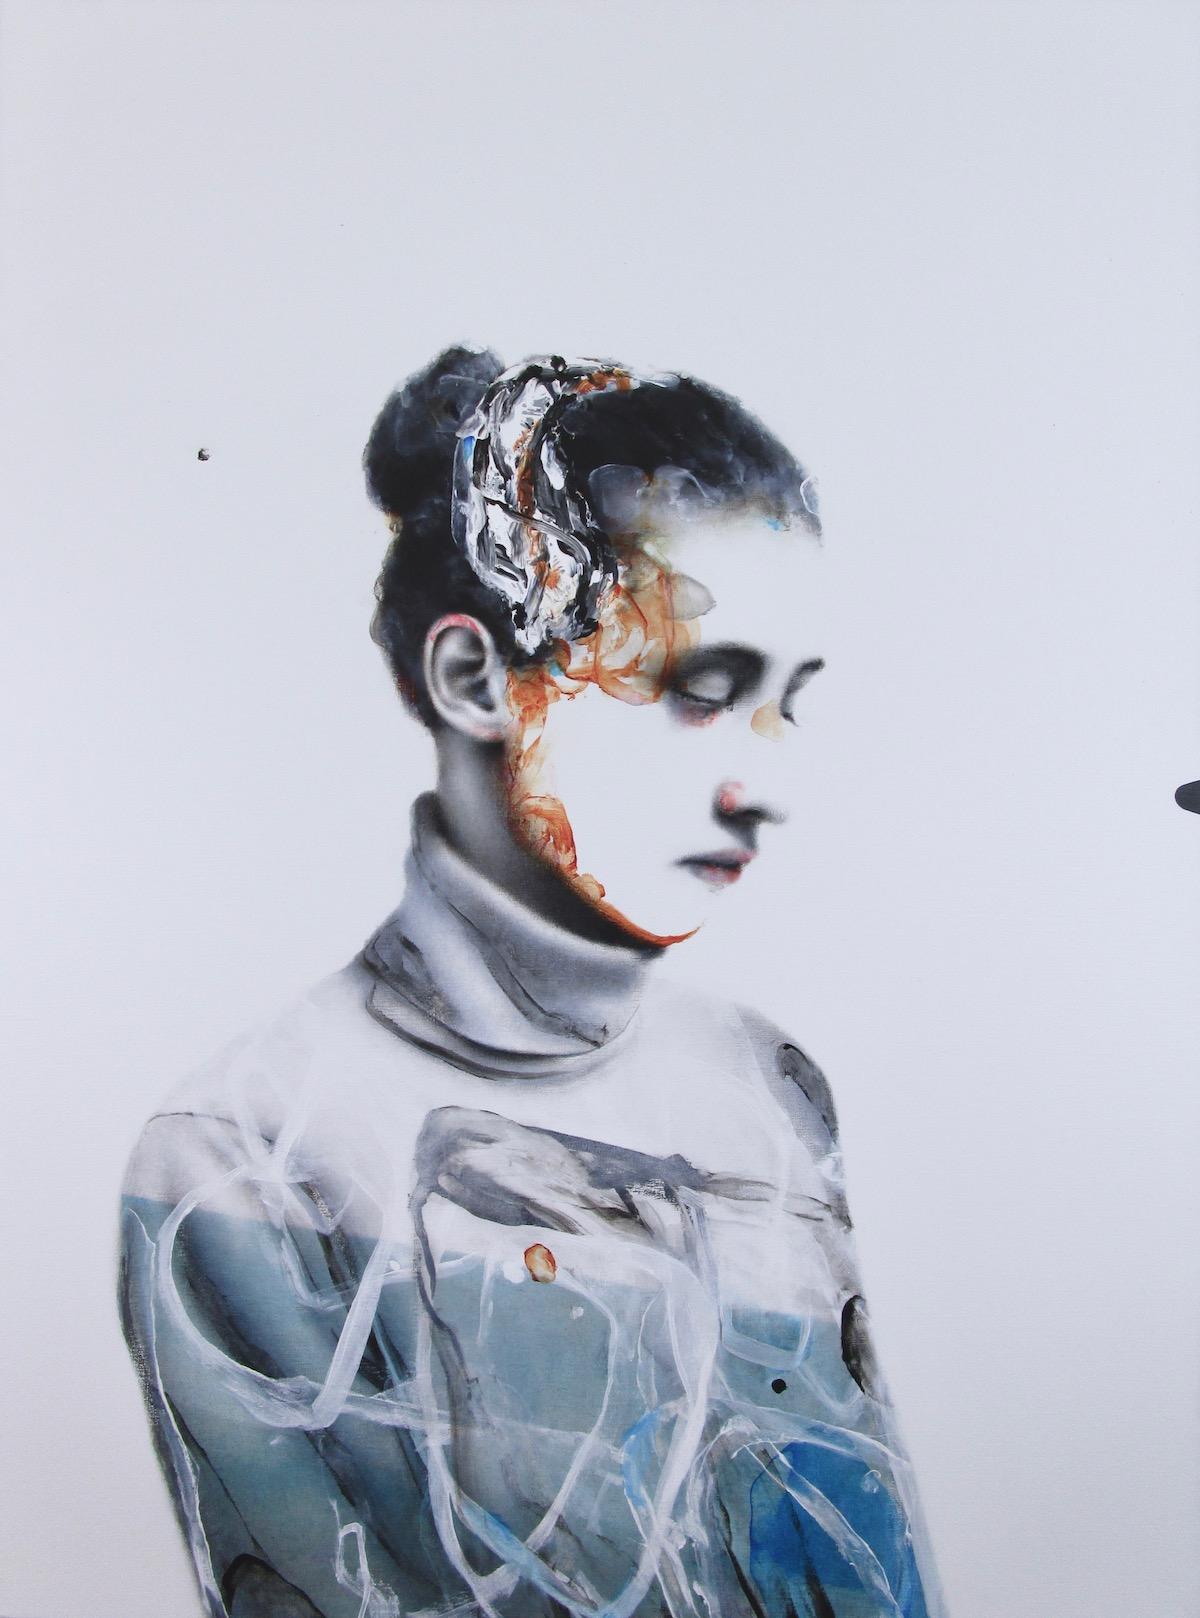 antoine cordet canvas toile peinture painting portrait art artist artiste peintre acrylic oil convergence phenomenon